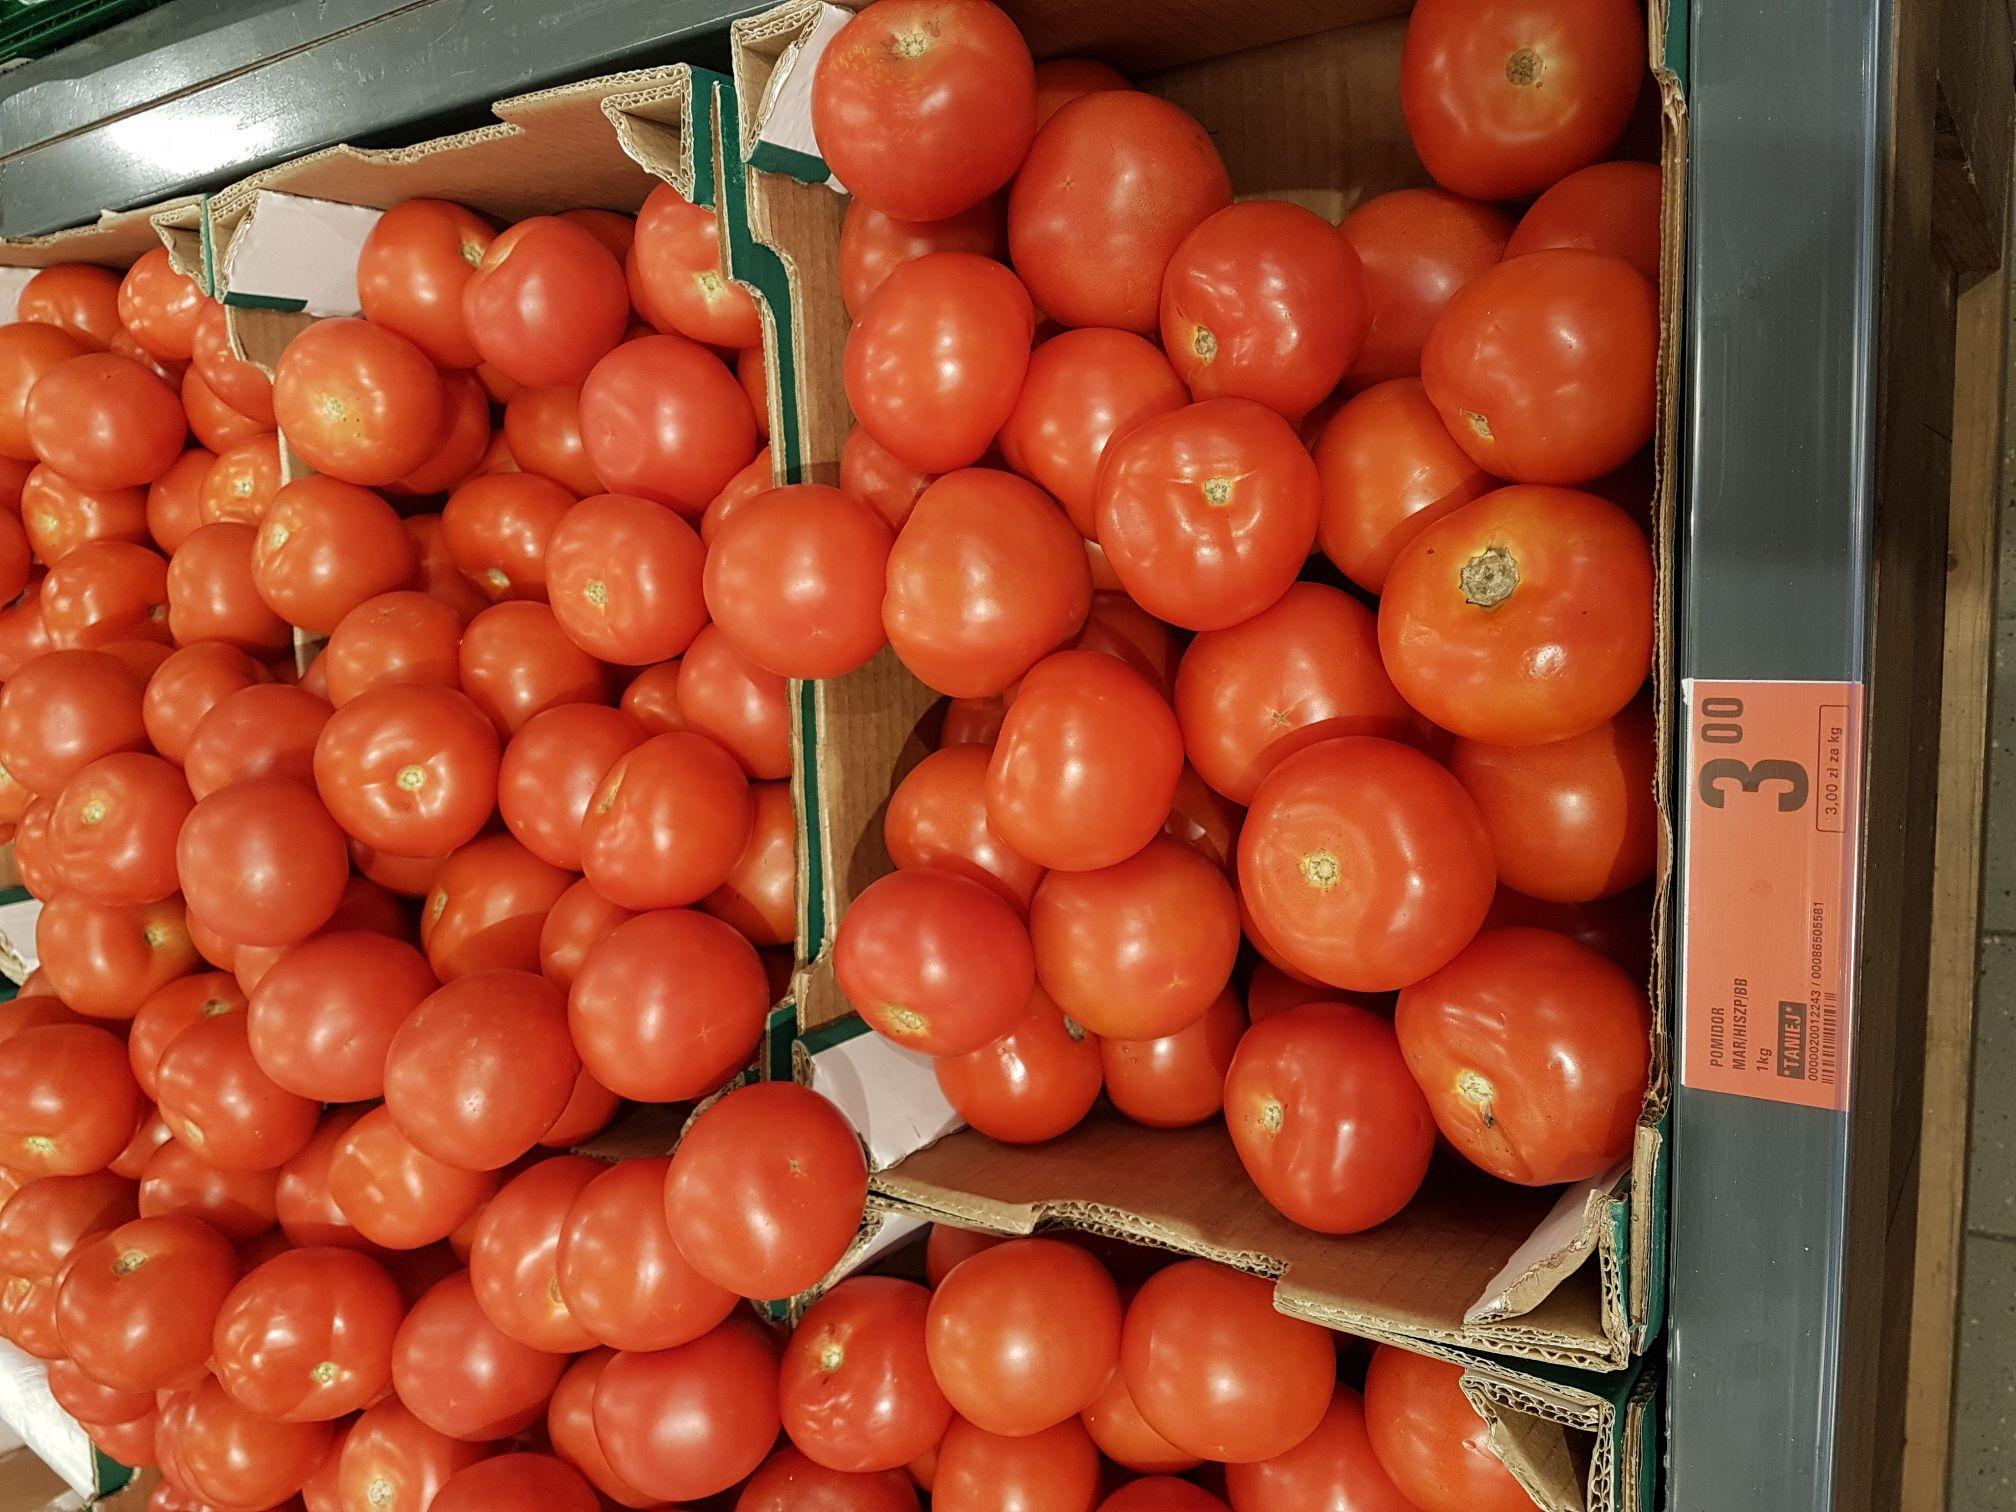 Pomidory 3 zł za 1 kg. Sklep Netto.